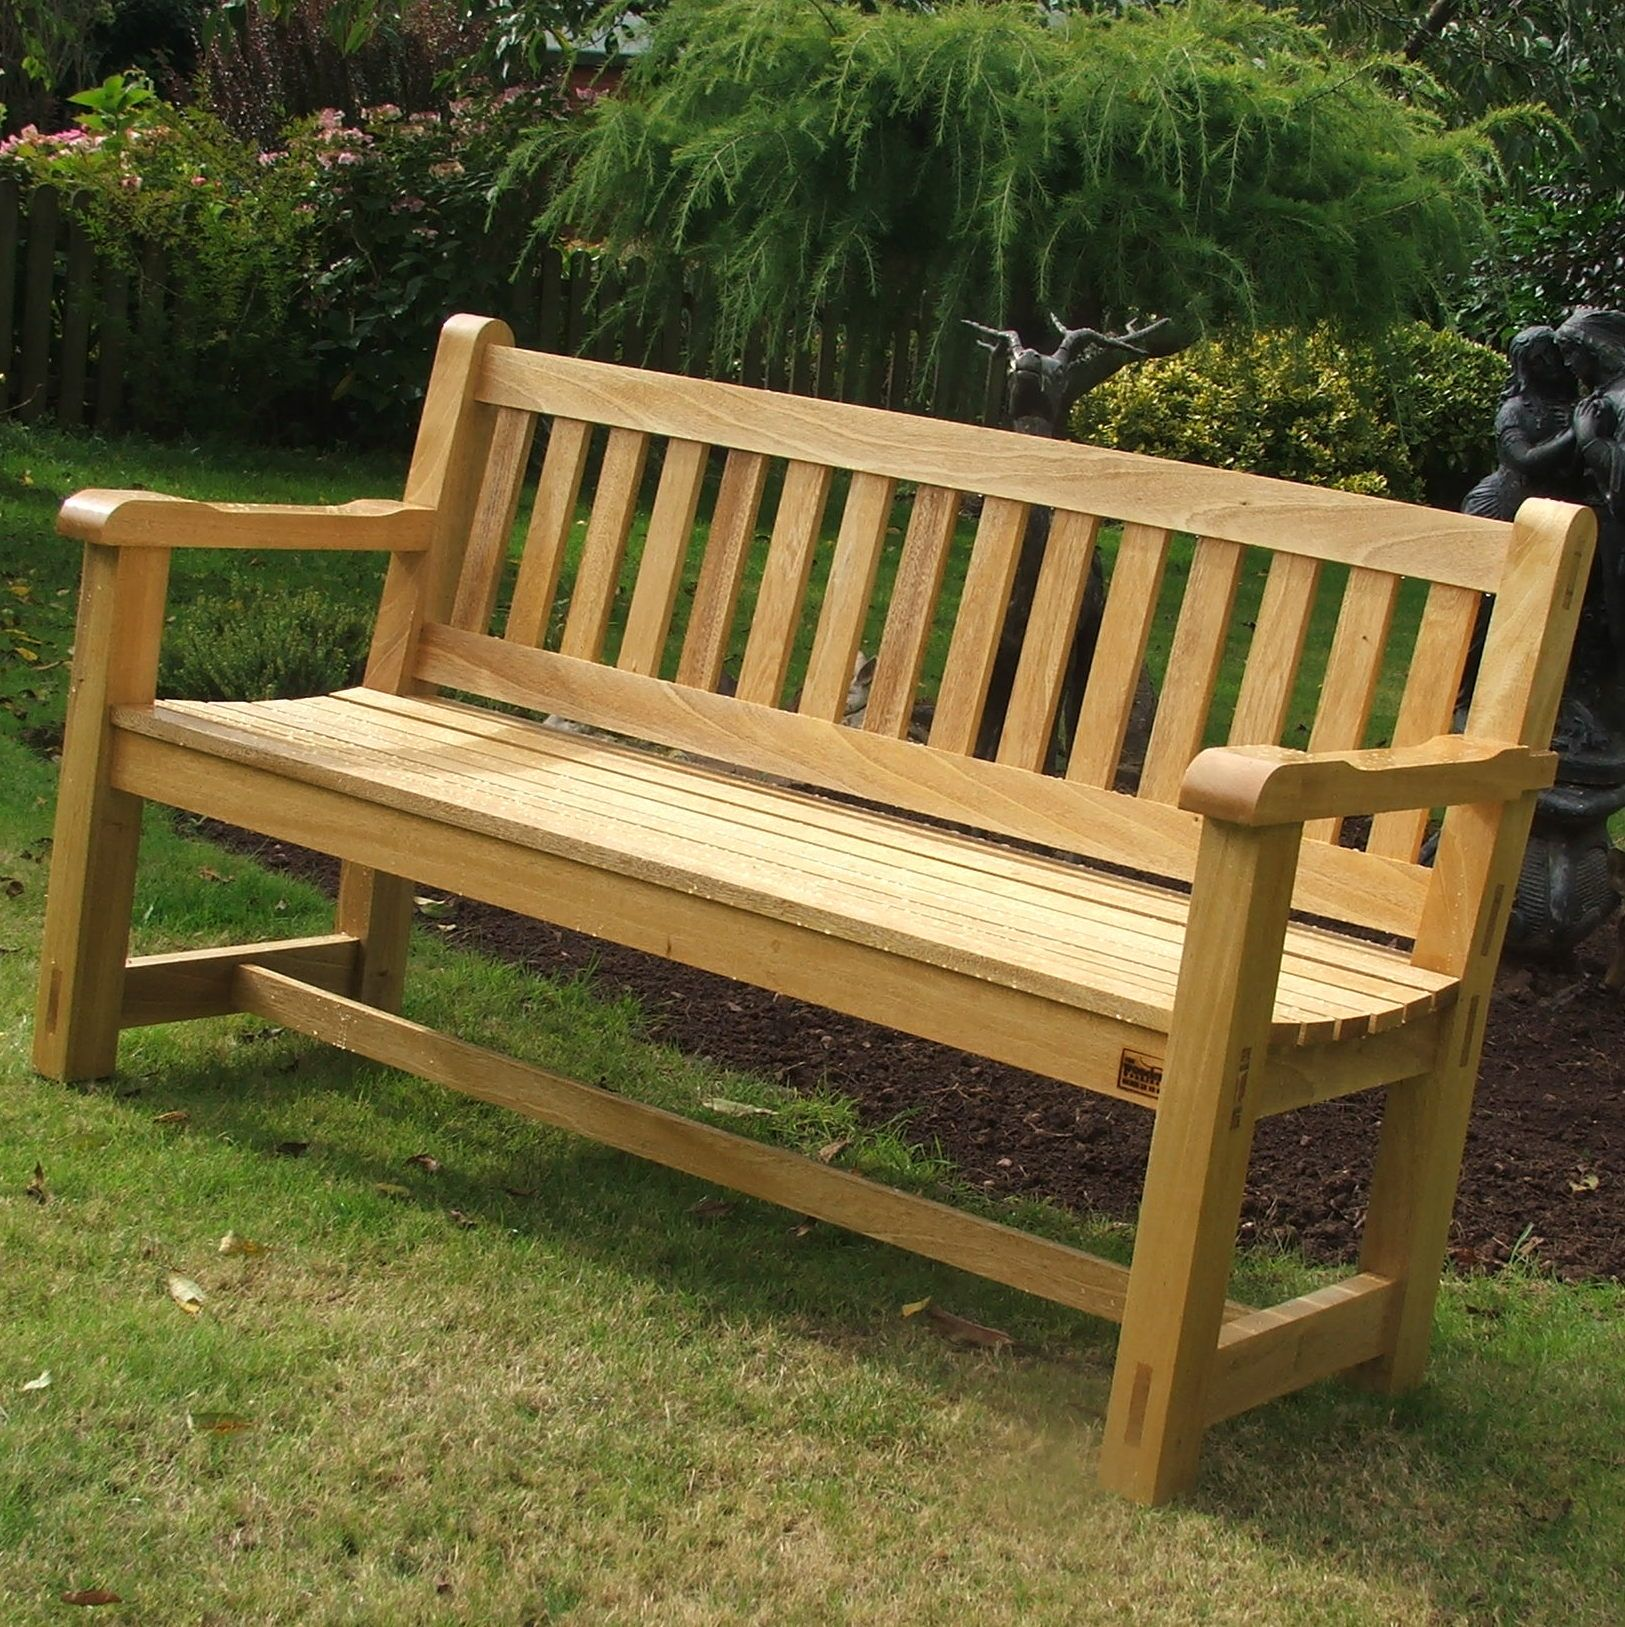 Inspiring Wooden Garden Benches #2 Wooden Garden Bench | Garden ...